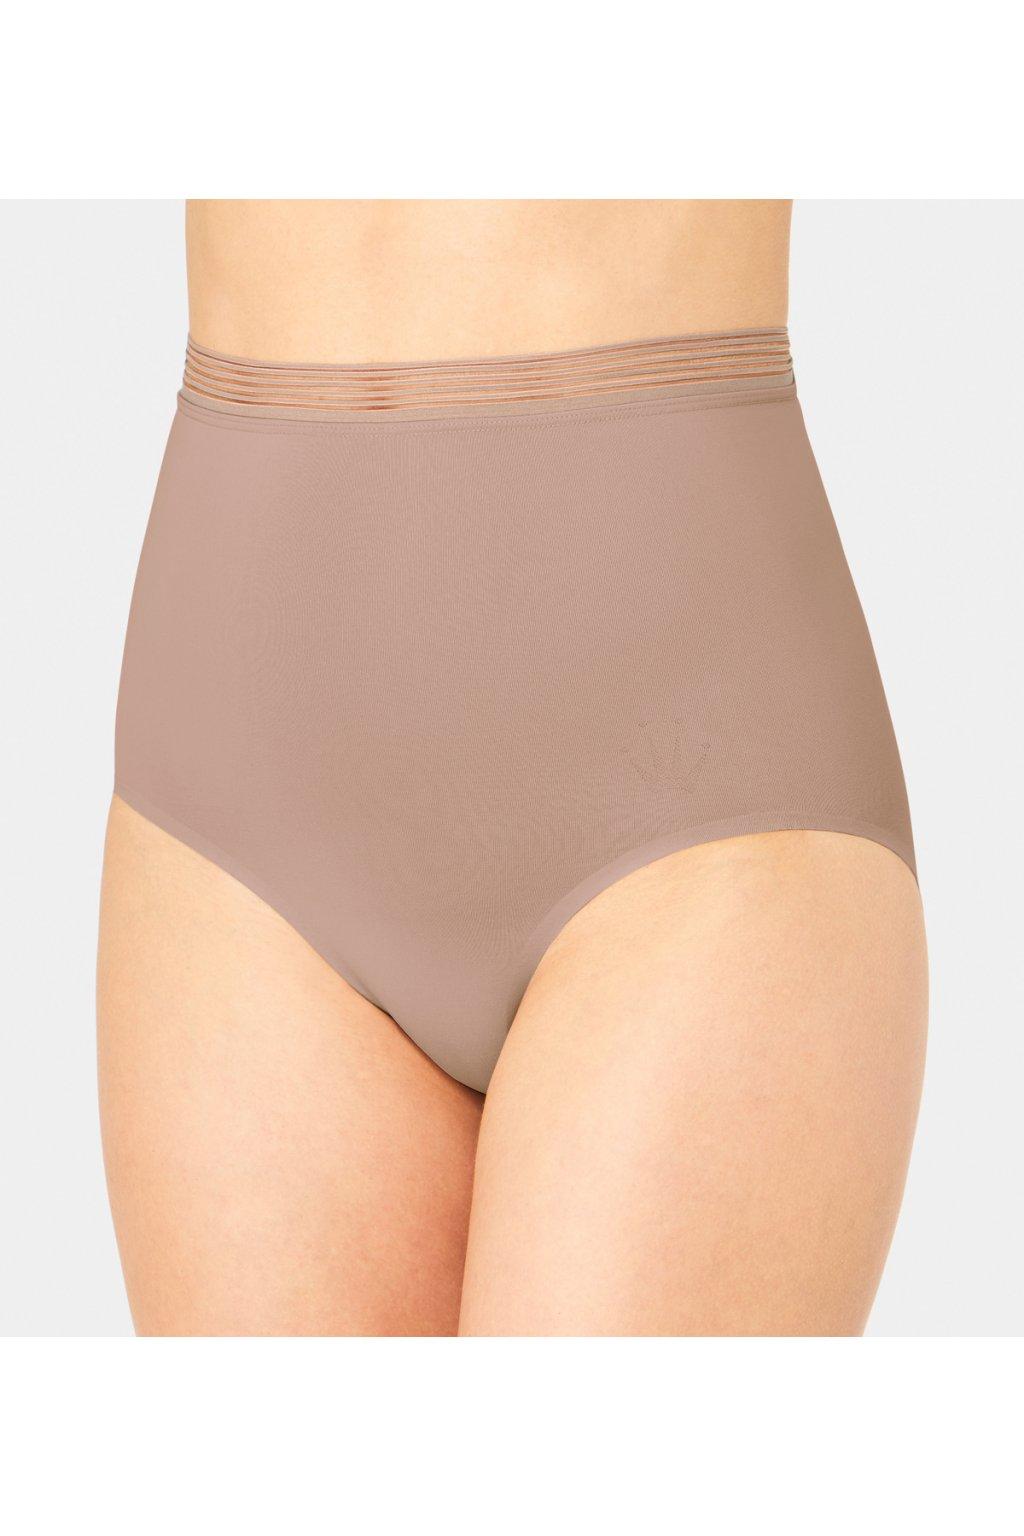 Stahovací kalhotky Infinite Sensation Highwaist Panty - Triumph